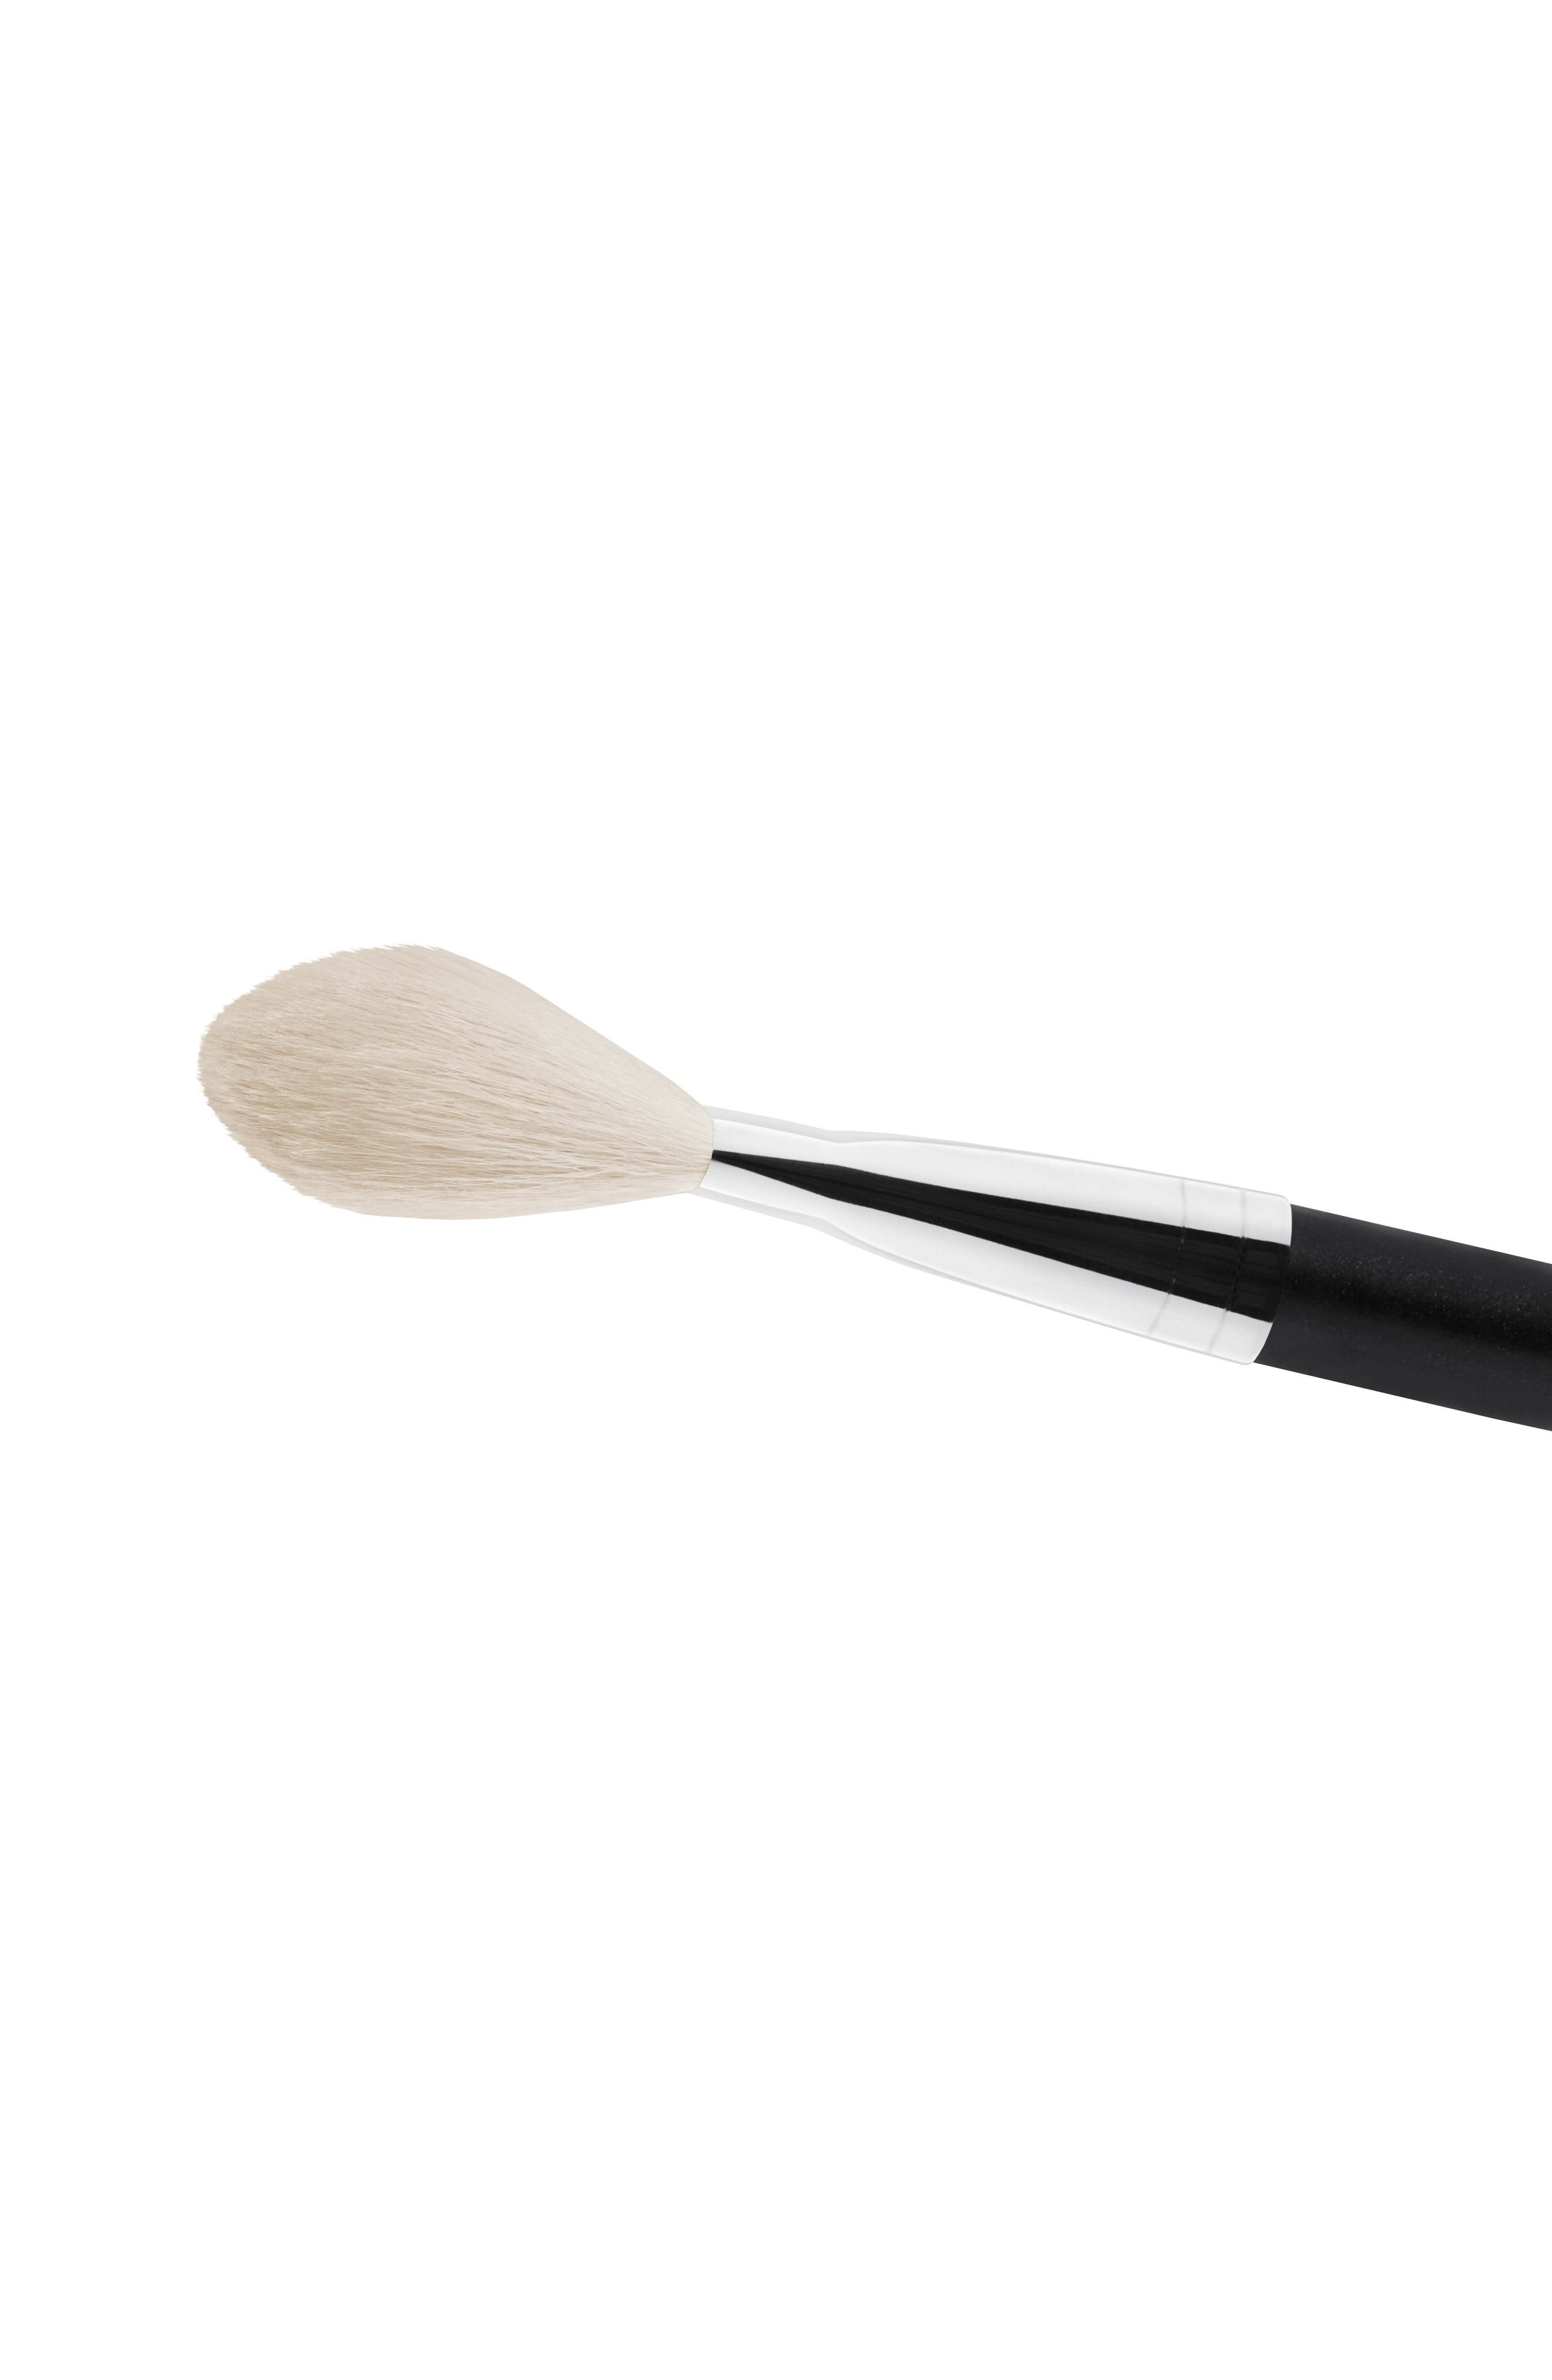 MAC 135 Large Flat Powder Brush,                             Alternate thumbnail 2, color,                             000